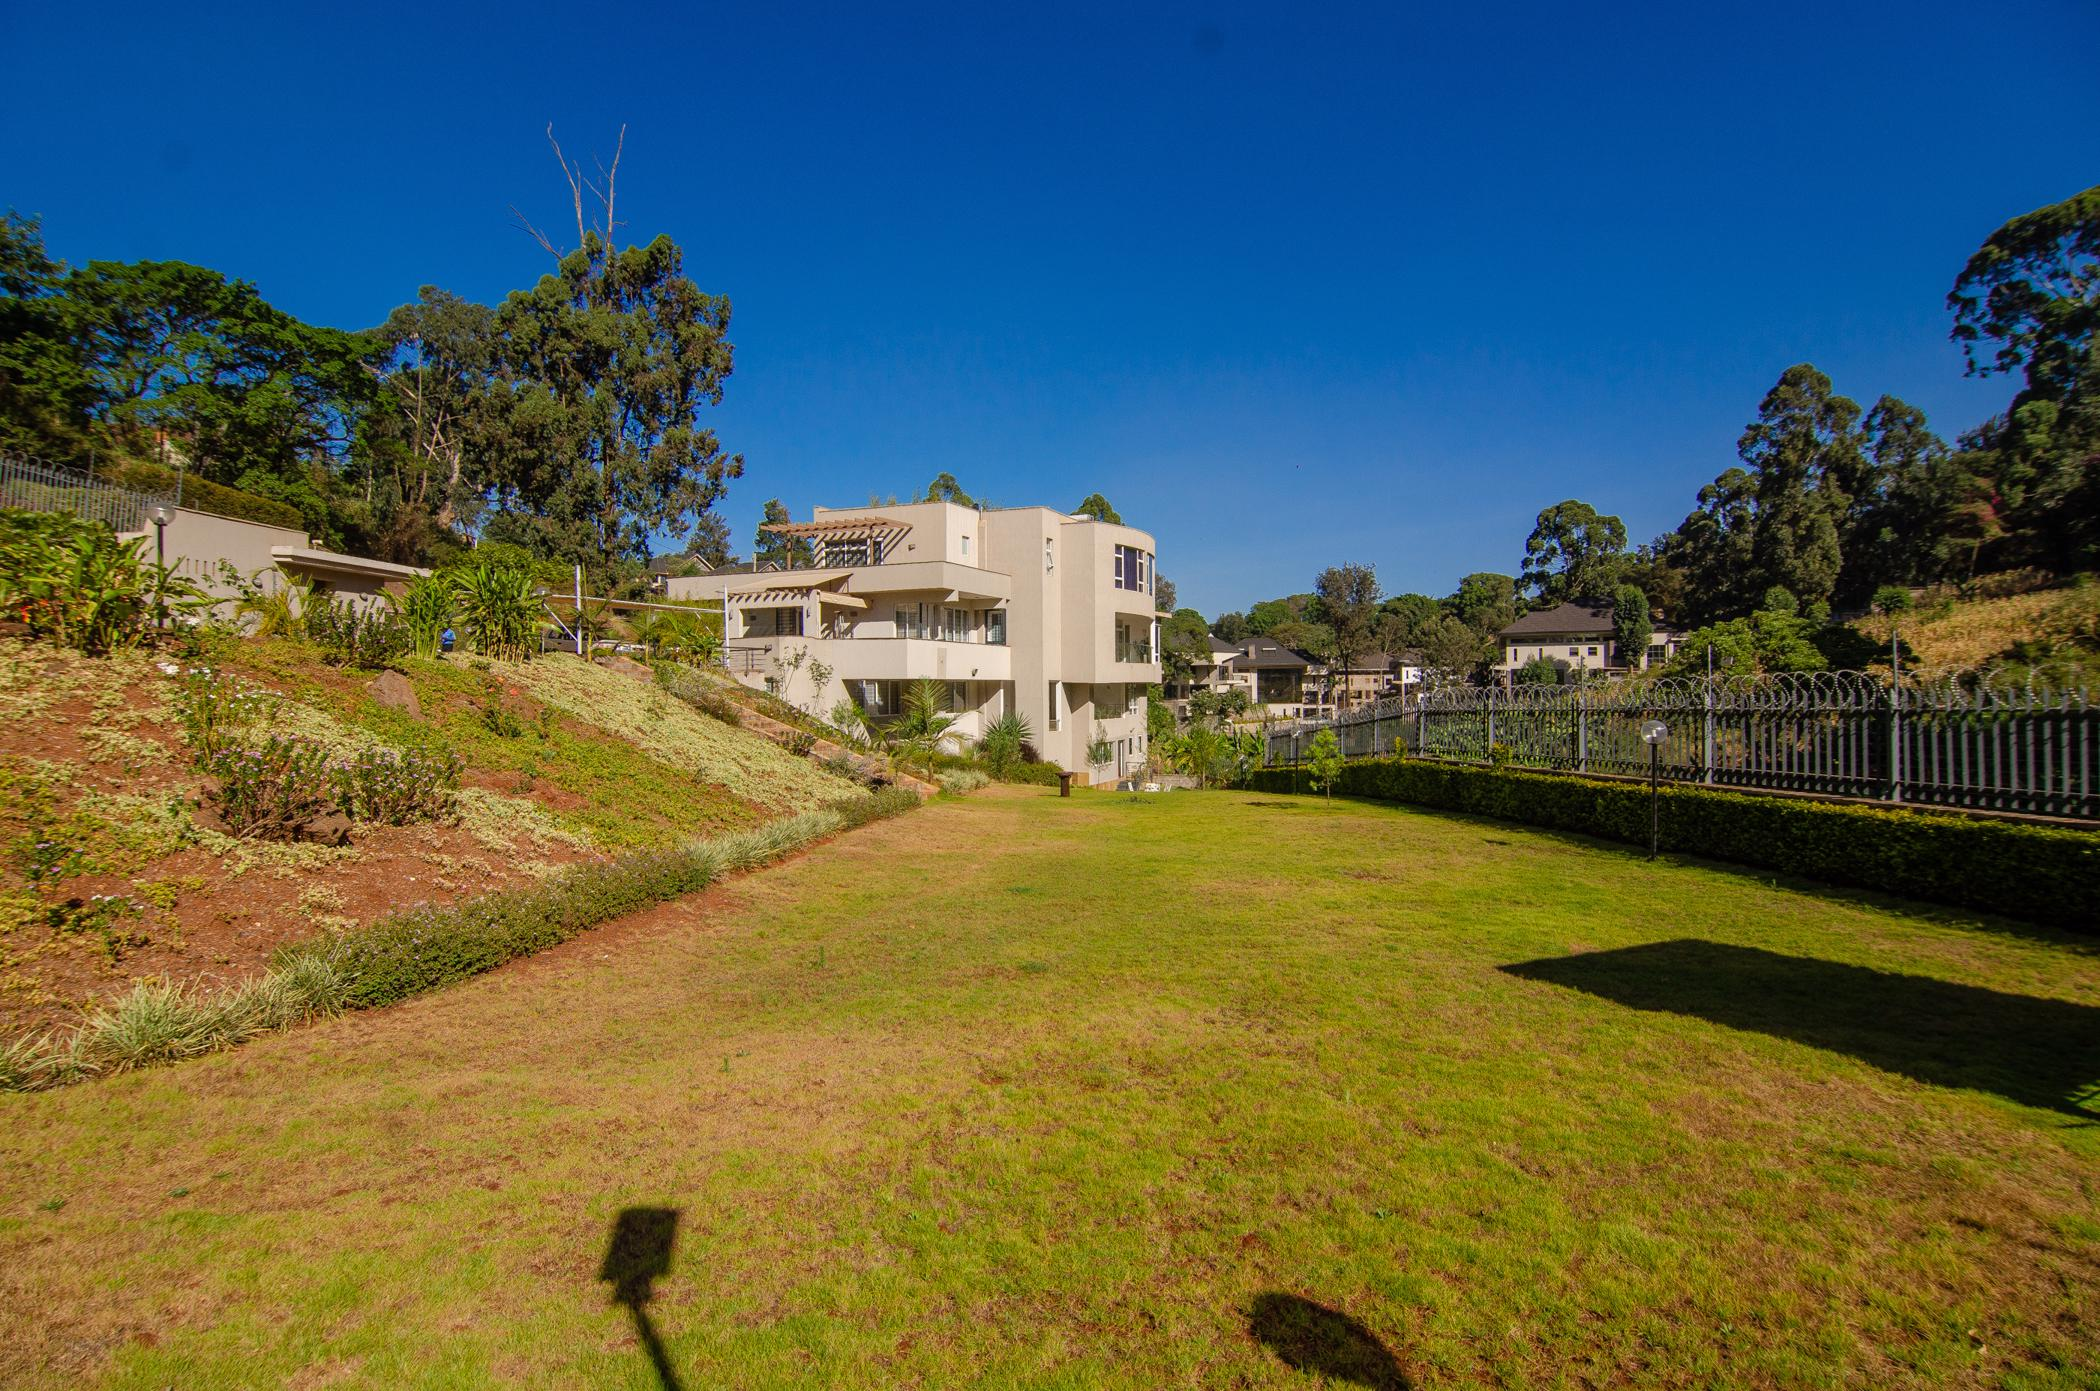 3 bedroom double-storey apartment to rent in Lower Kabete (Kenya)